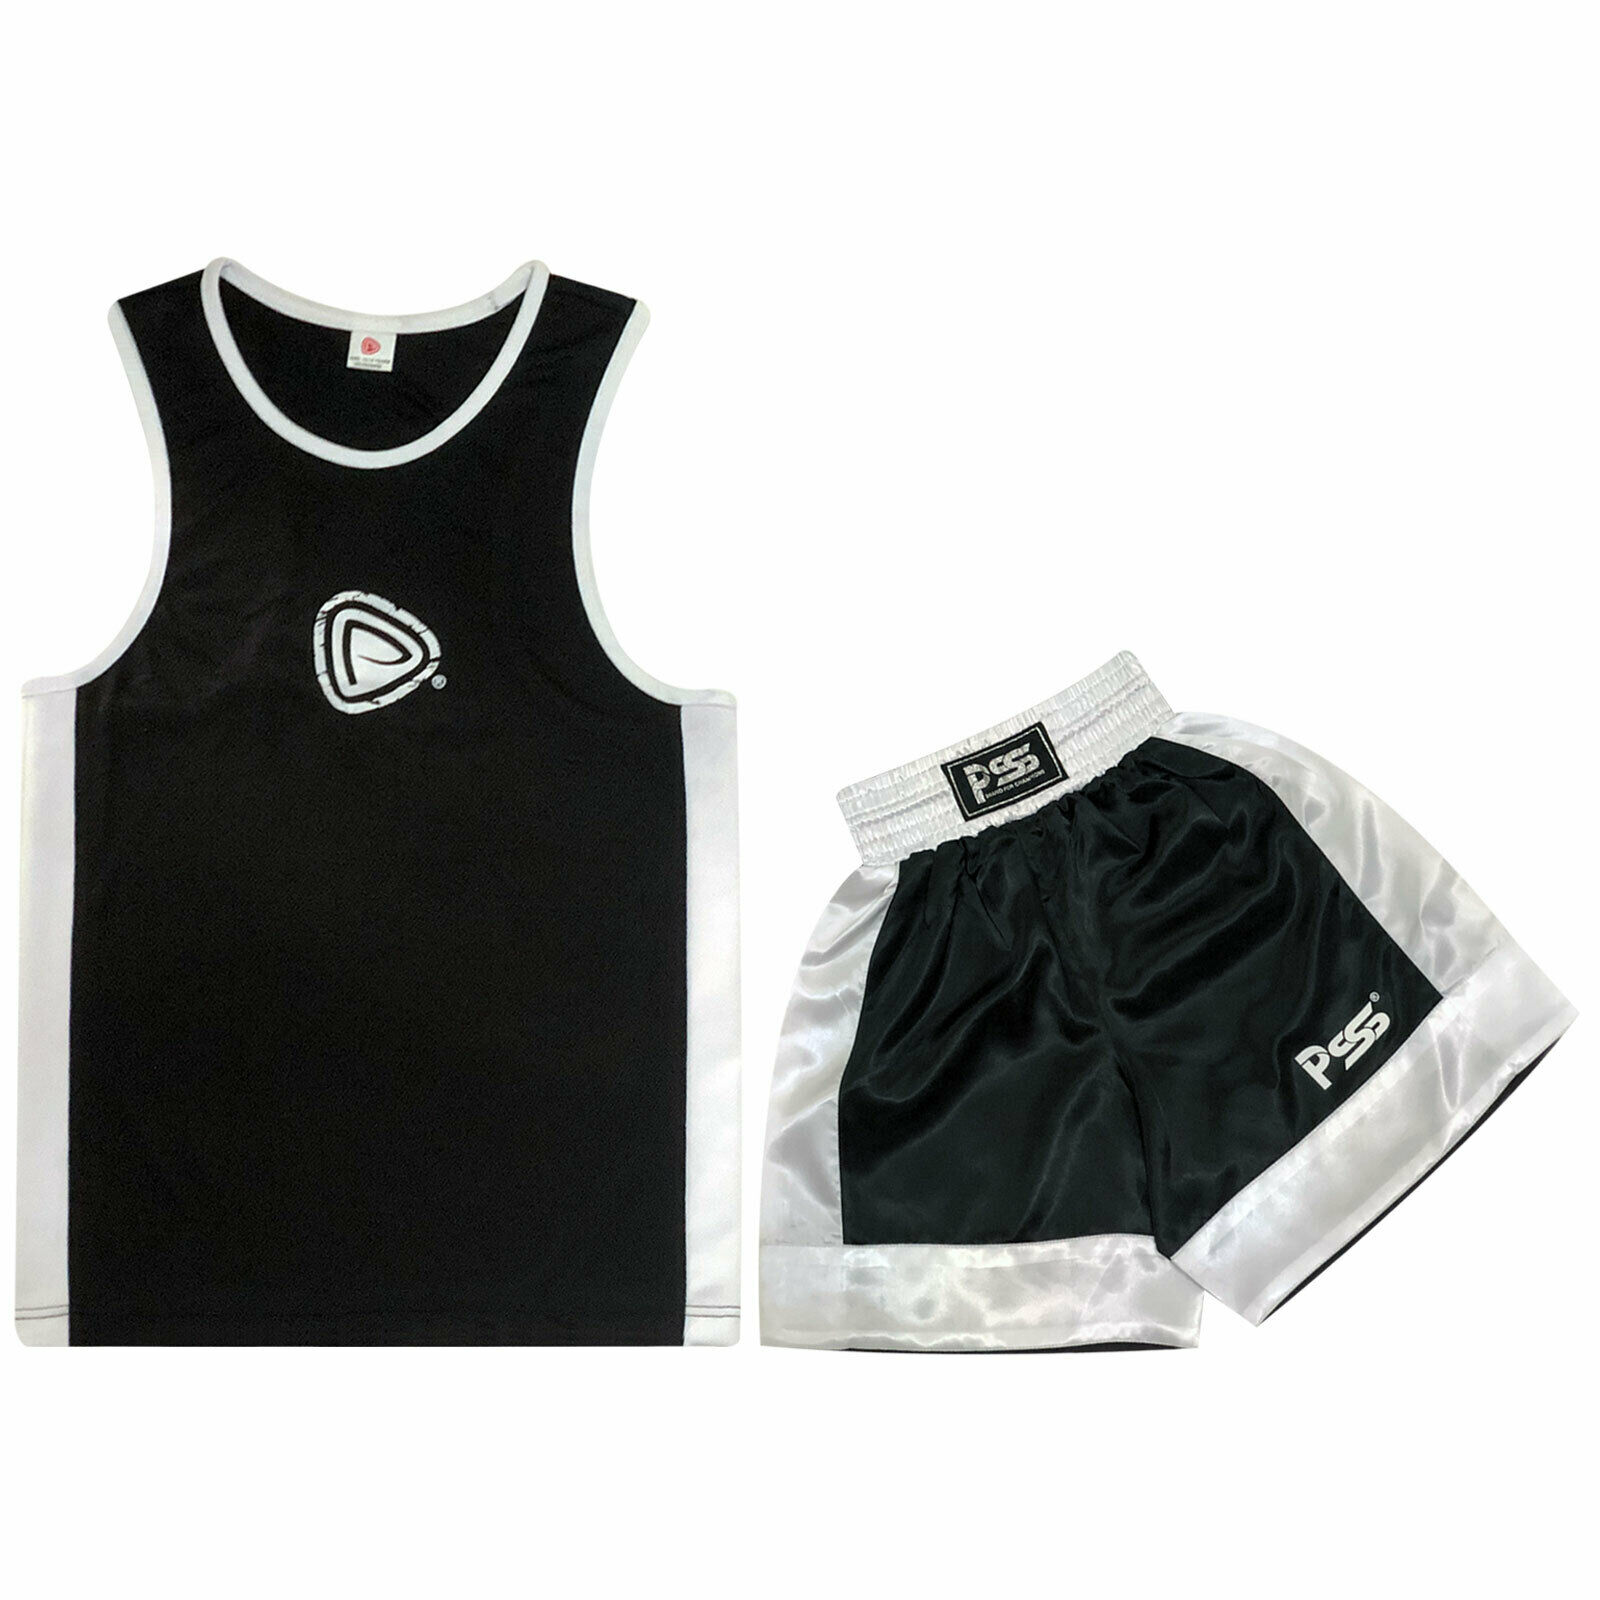 Black Kids Set 3 Pcs Boxing Uniform Boxing Glove 1012 Focus Pad 1106 SET - 12